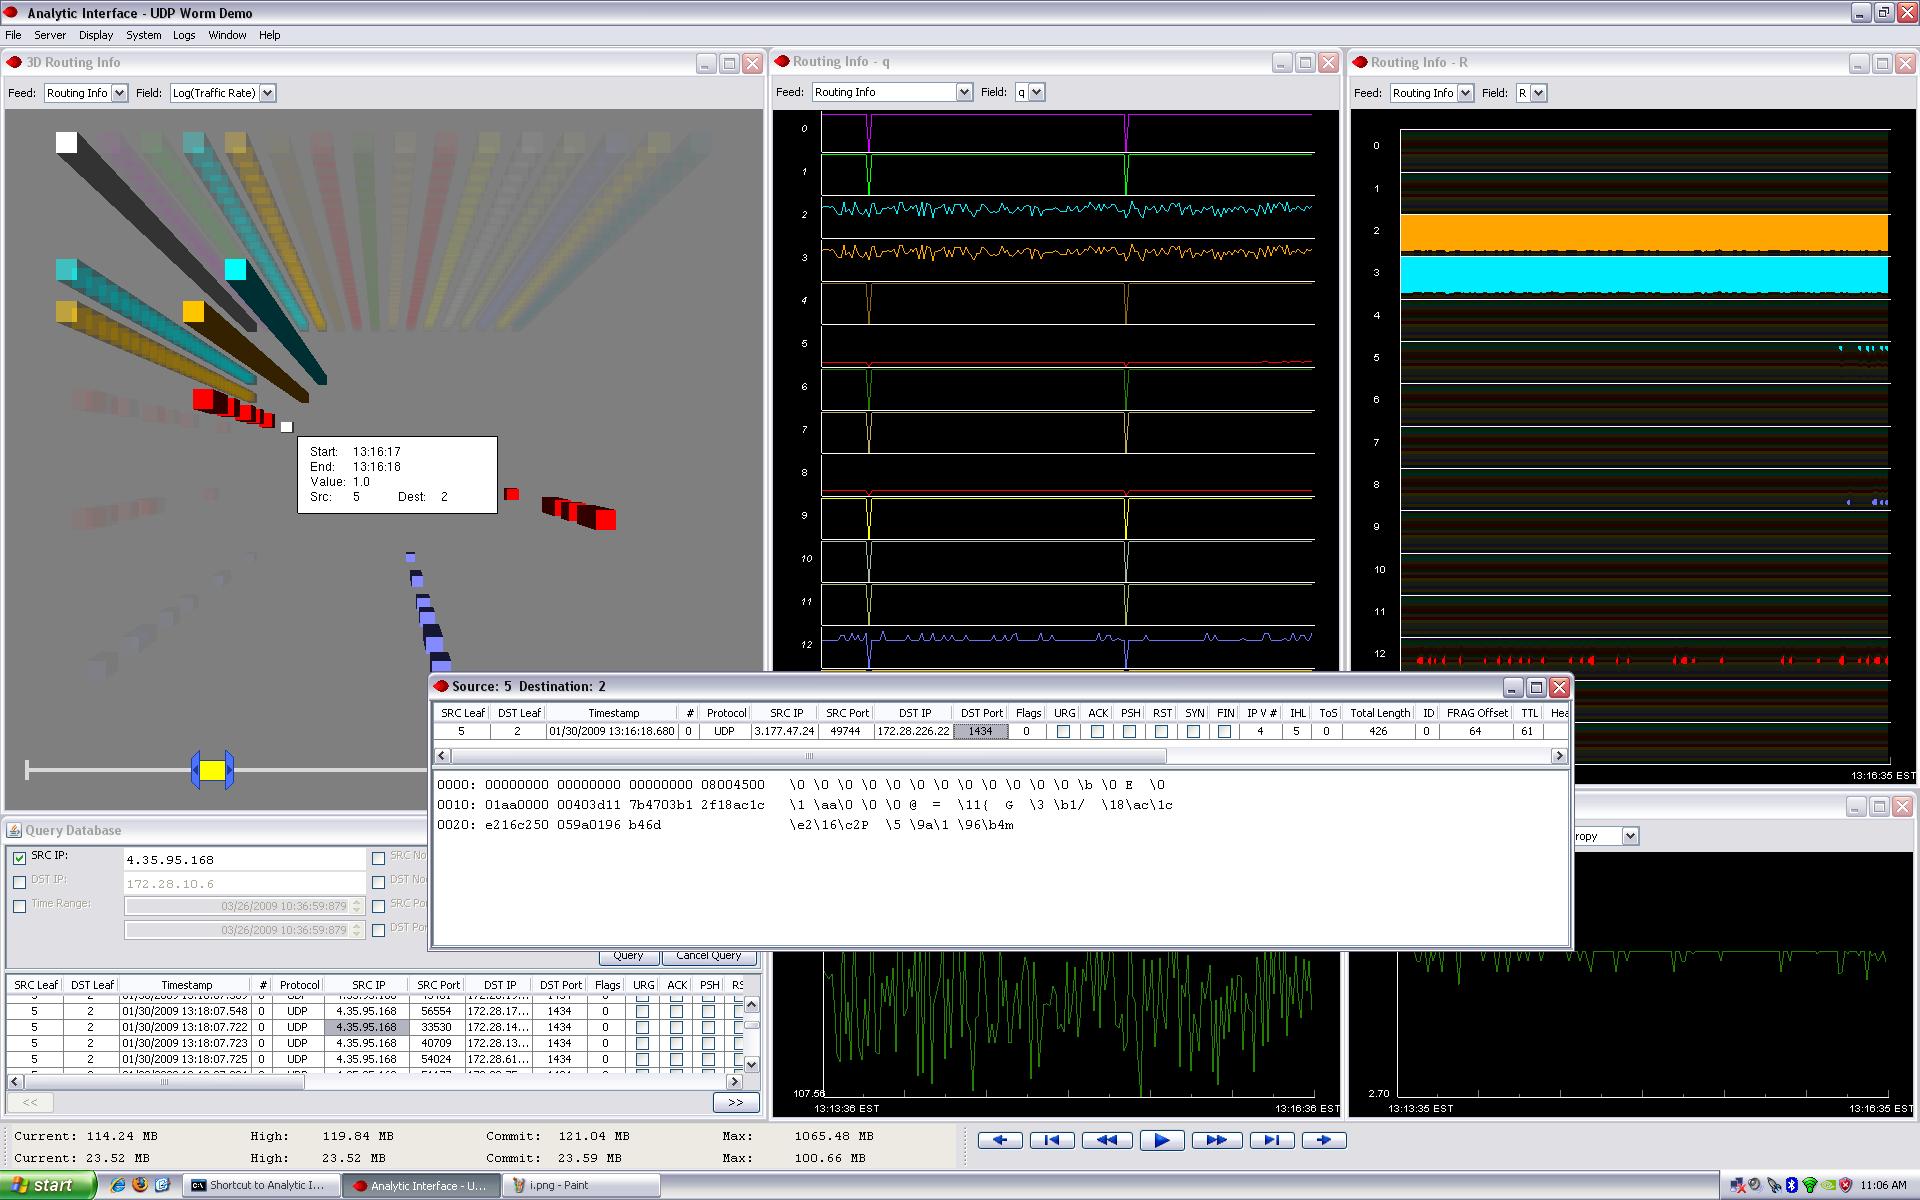 Equilibrium Networks UI screenshot showing Slammer worm amongst all UDP/ICMP traffic on a gigabit network testbed